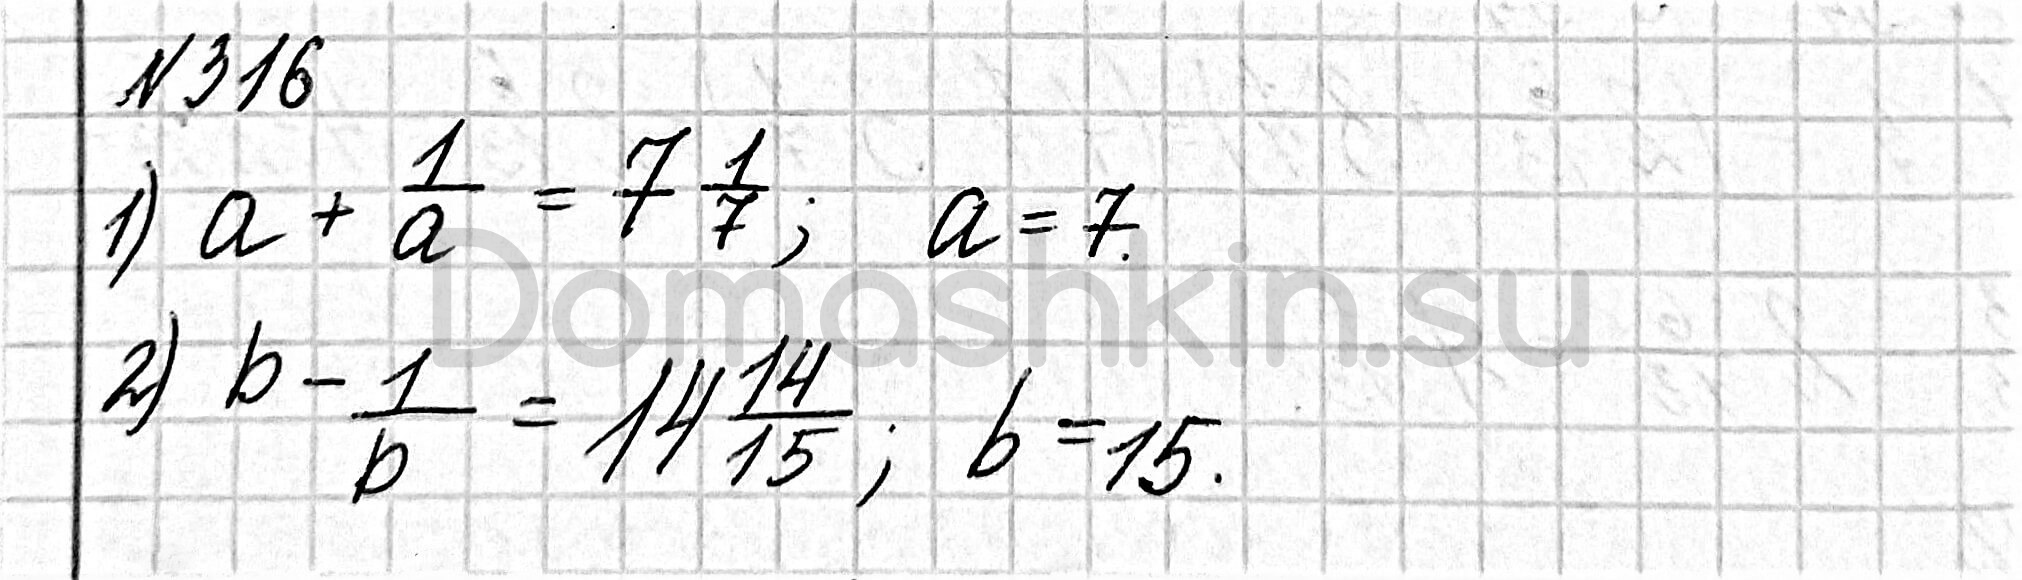 Математика 6 класс учебник Мерзляк номер 316 решение